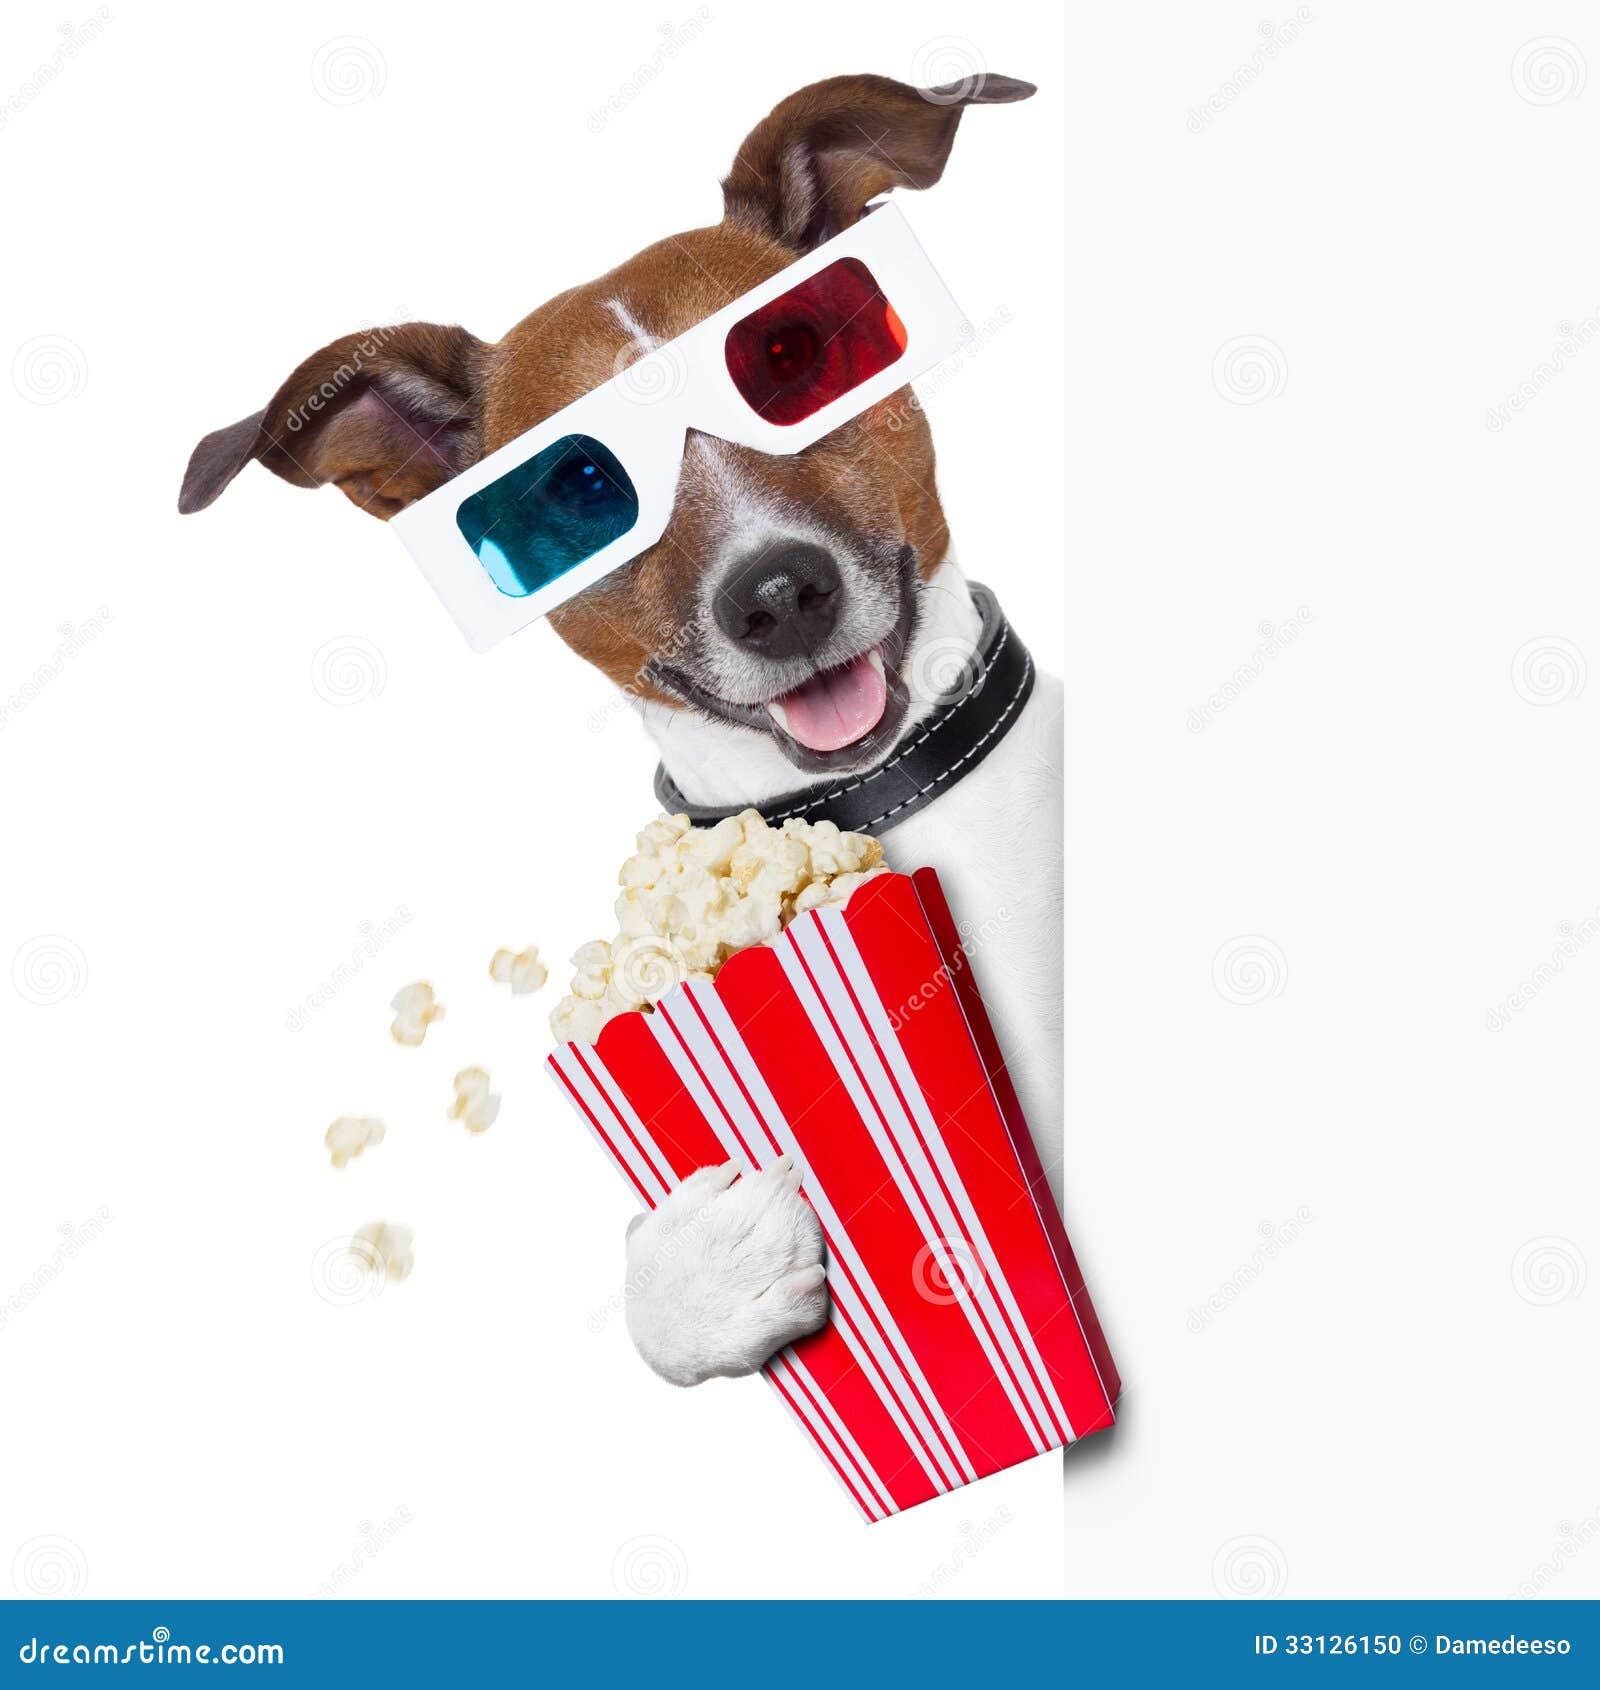 D Movie Clip On Glasses